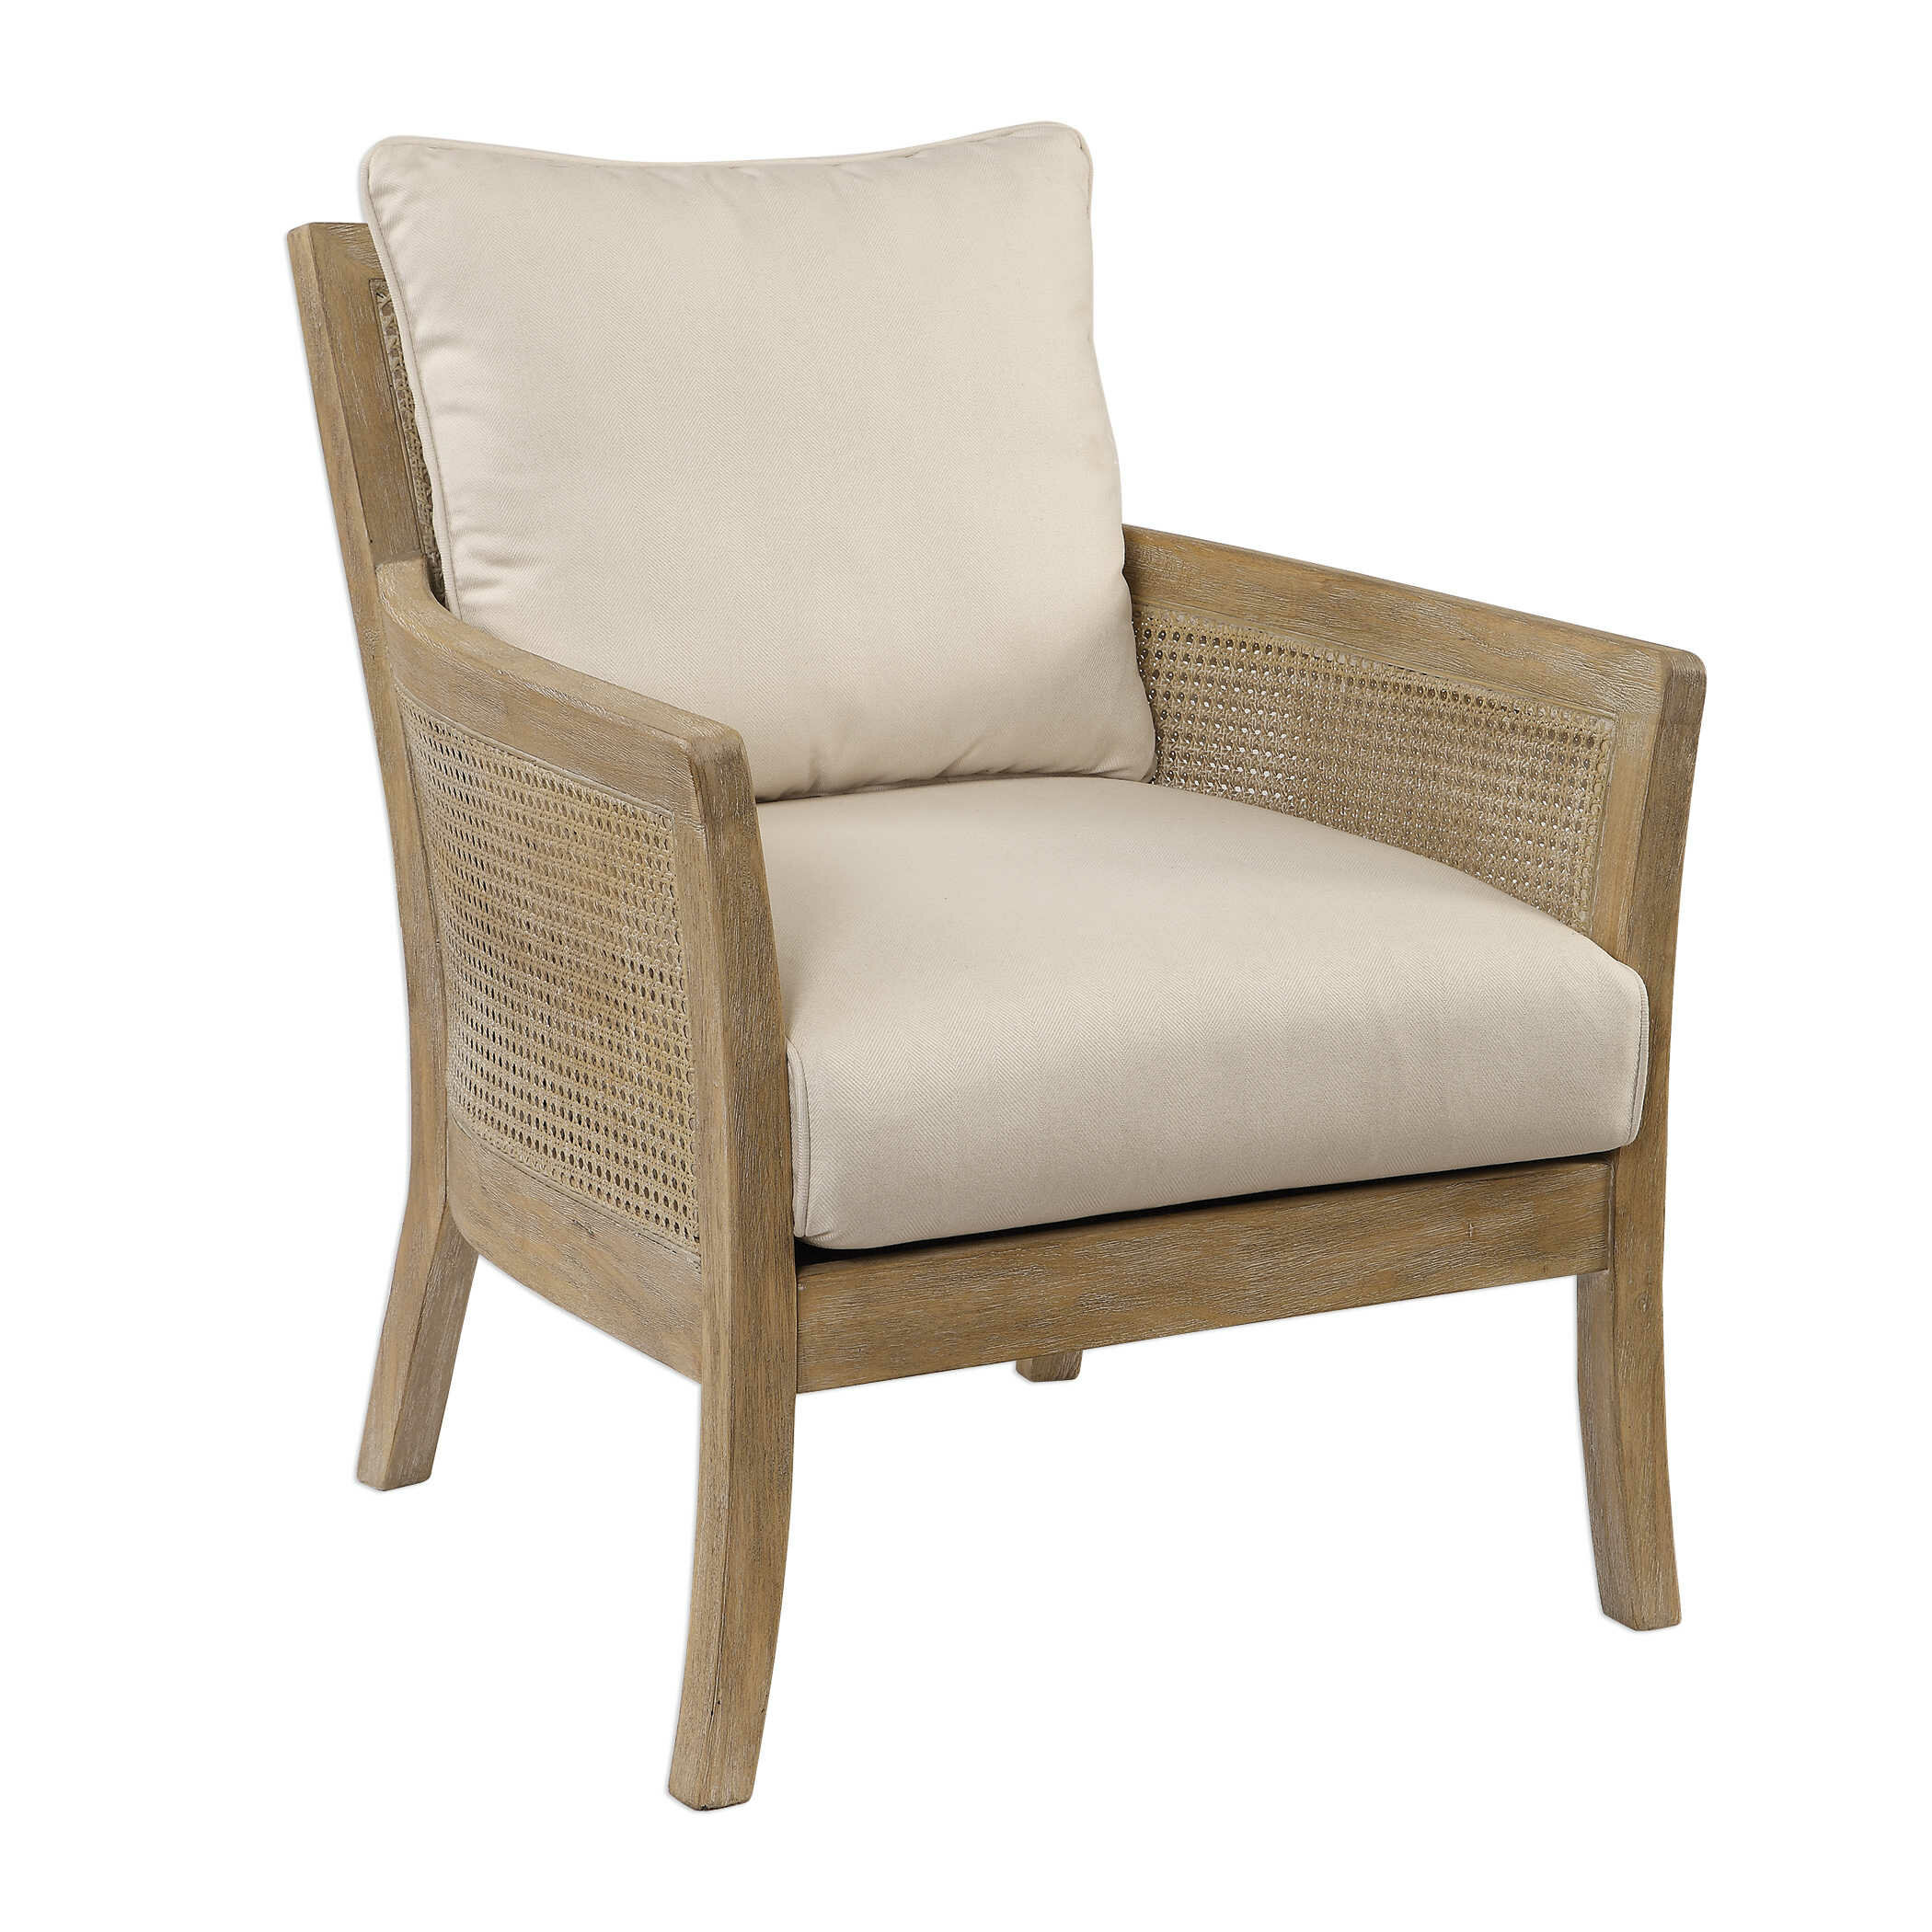 Awe Inspiring Parkton Armchair Interior Design Ideas Tzicisoteloinfo